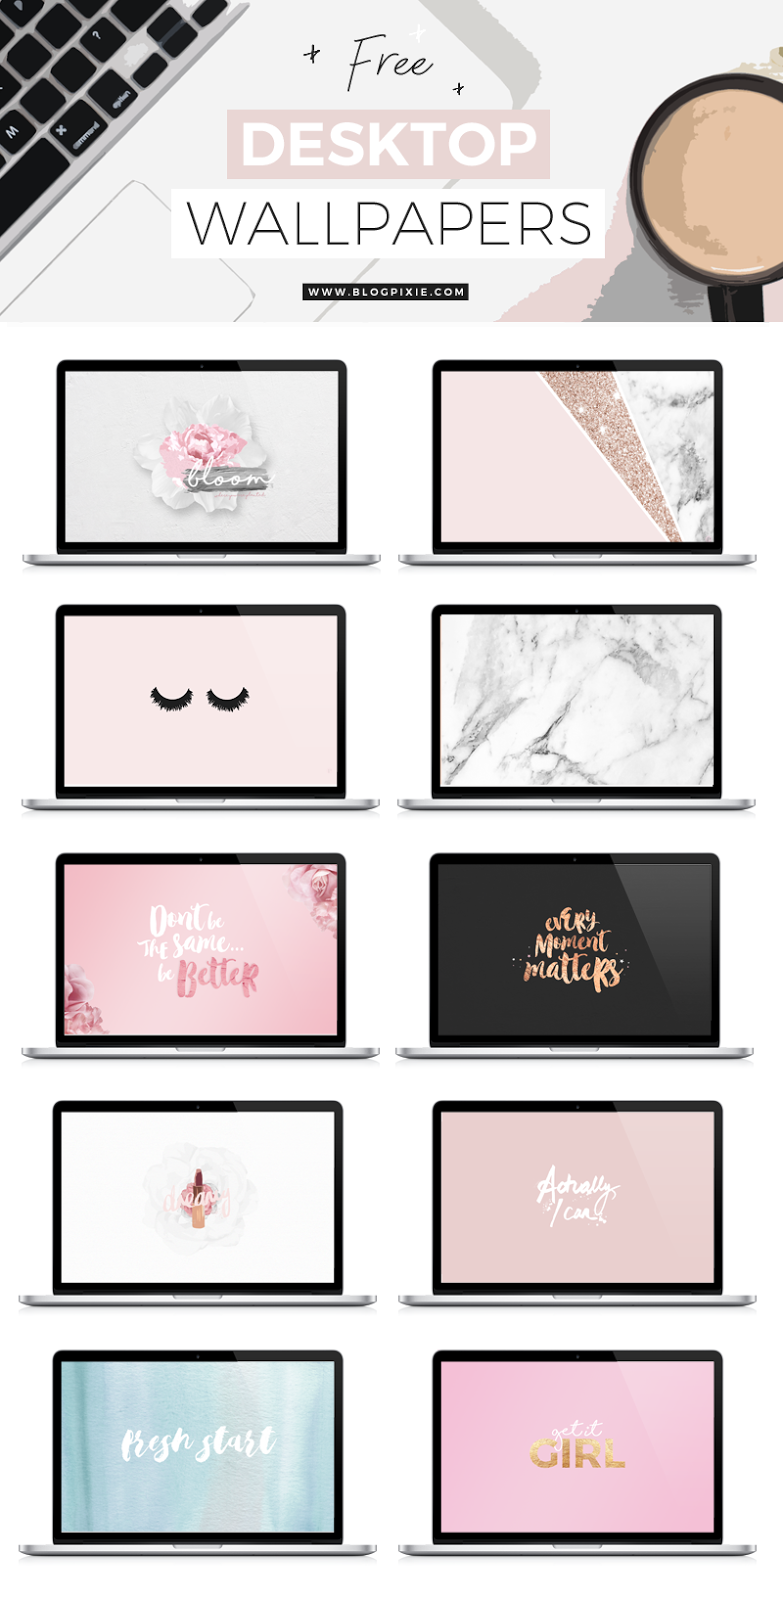 free freebies wallpapers desktop backgrounds downloadables pretty 2017